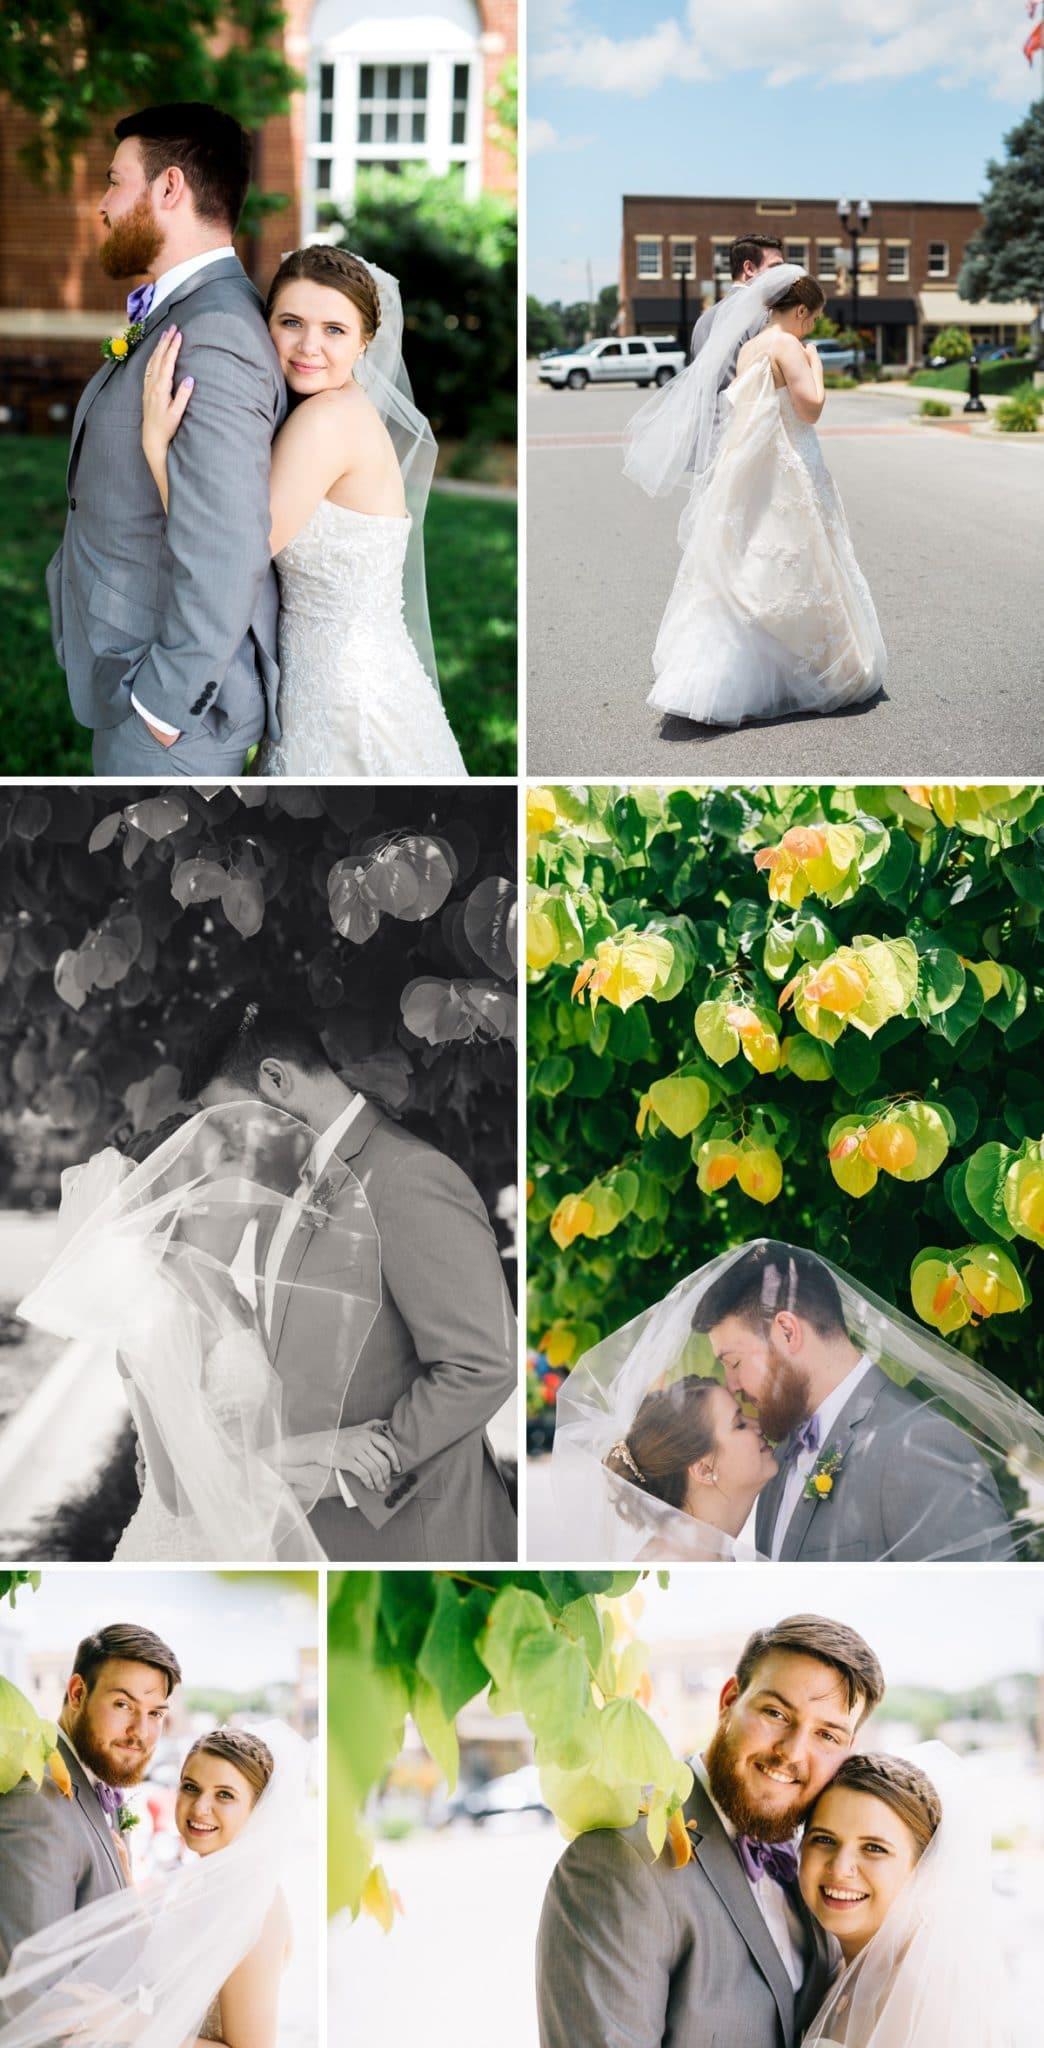 Winchester TN Wedding, Nashville Wedding Photographer, Lindsay and Gareth